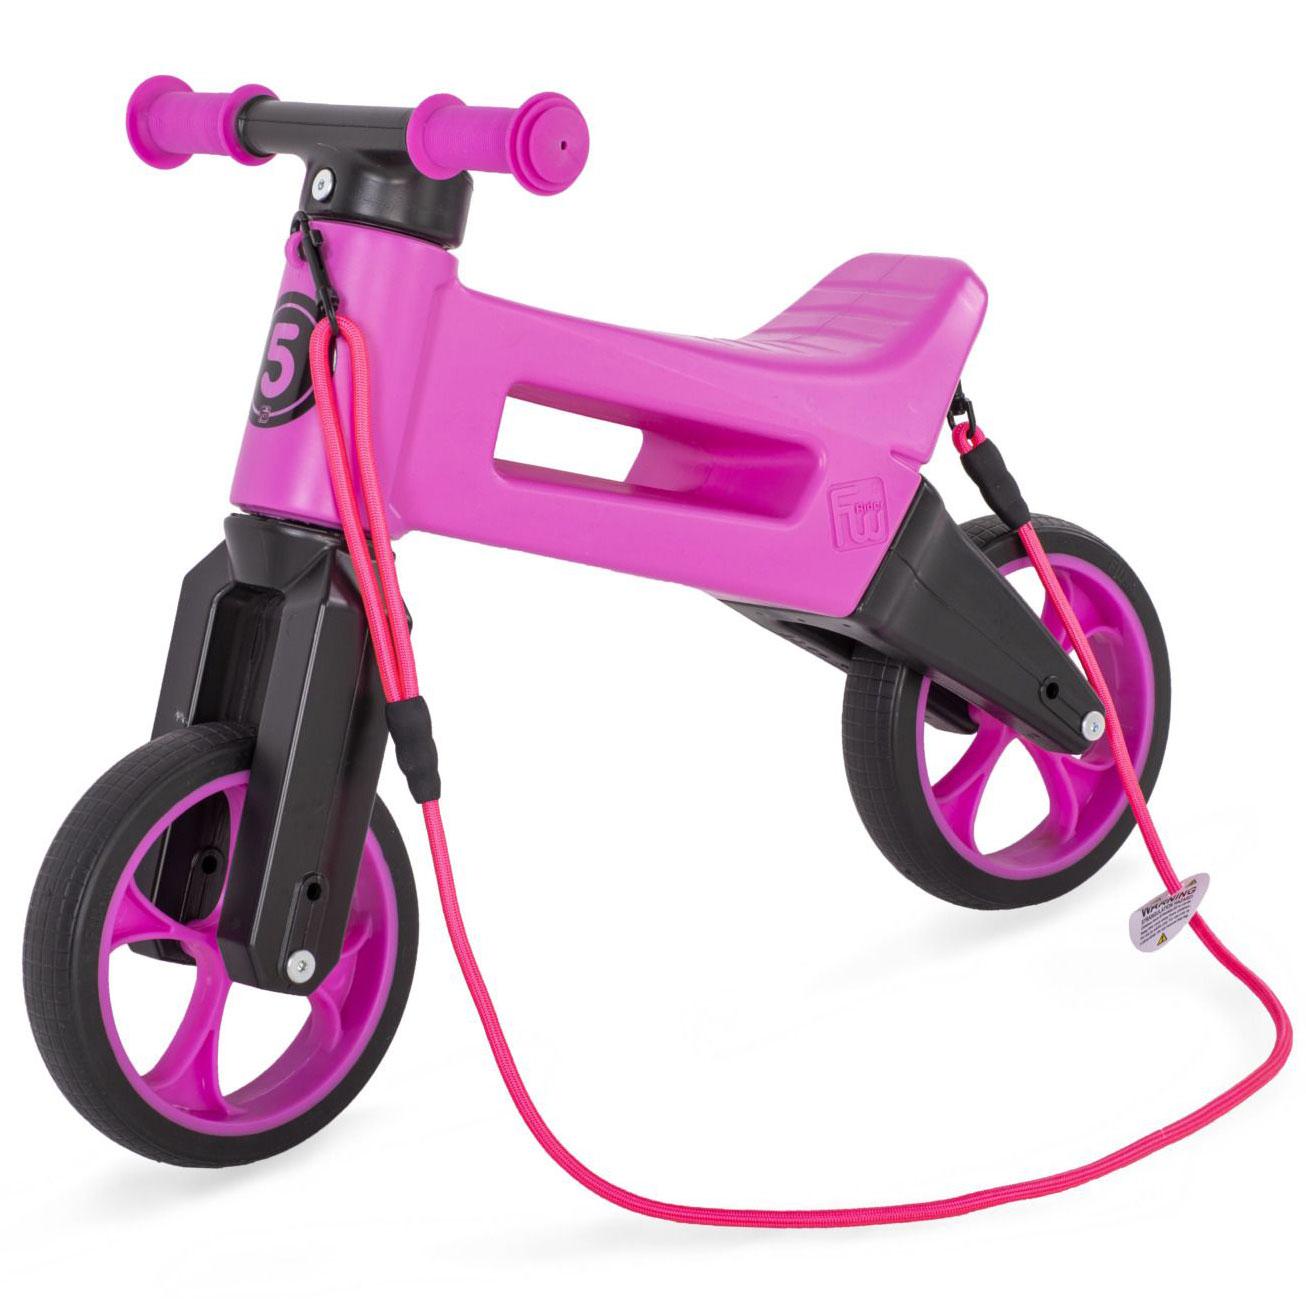 Odrážadlo FUNNY WHEELS Rider SuperSport fialové 2v1